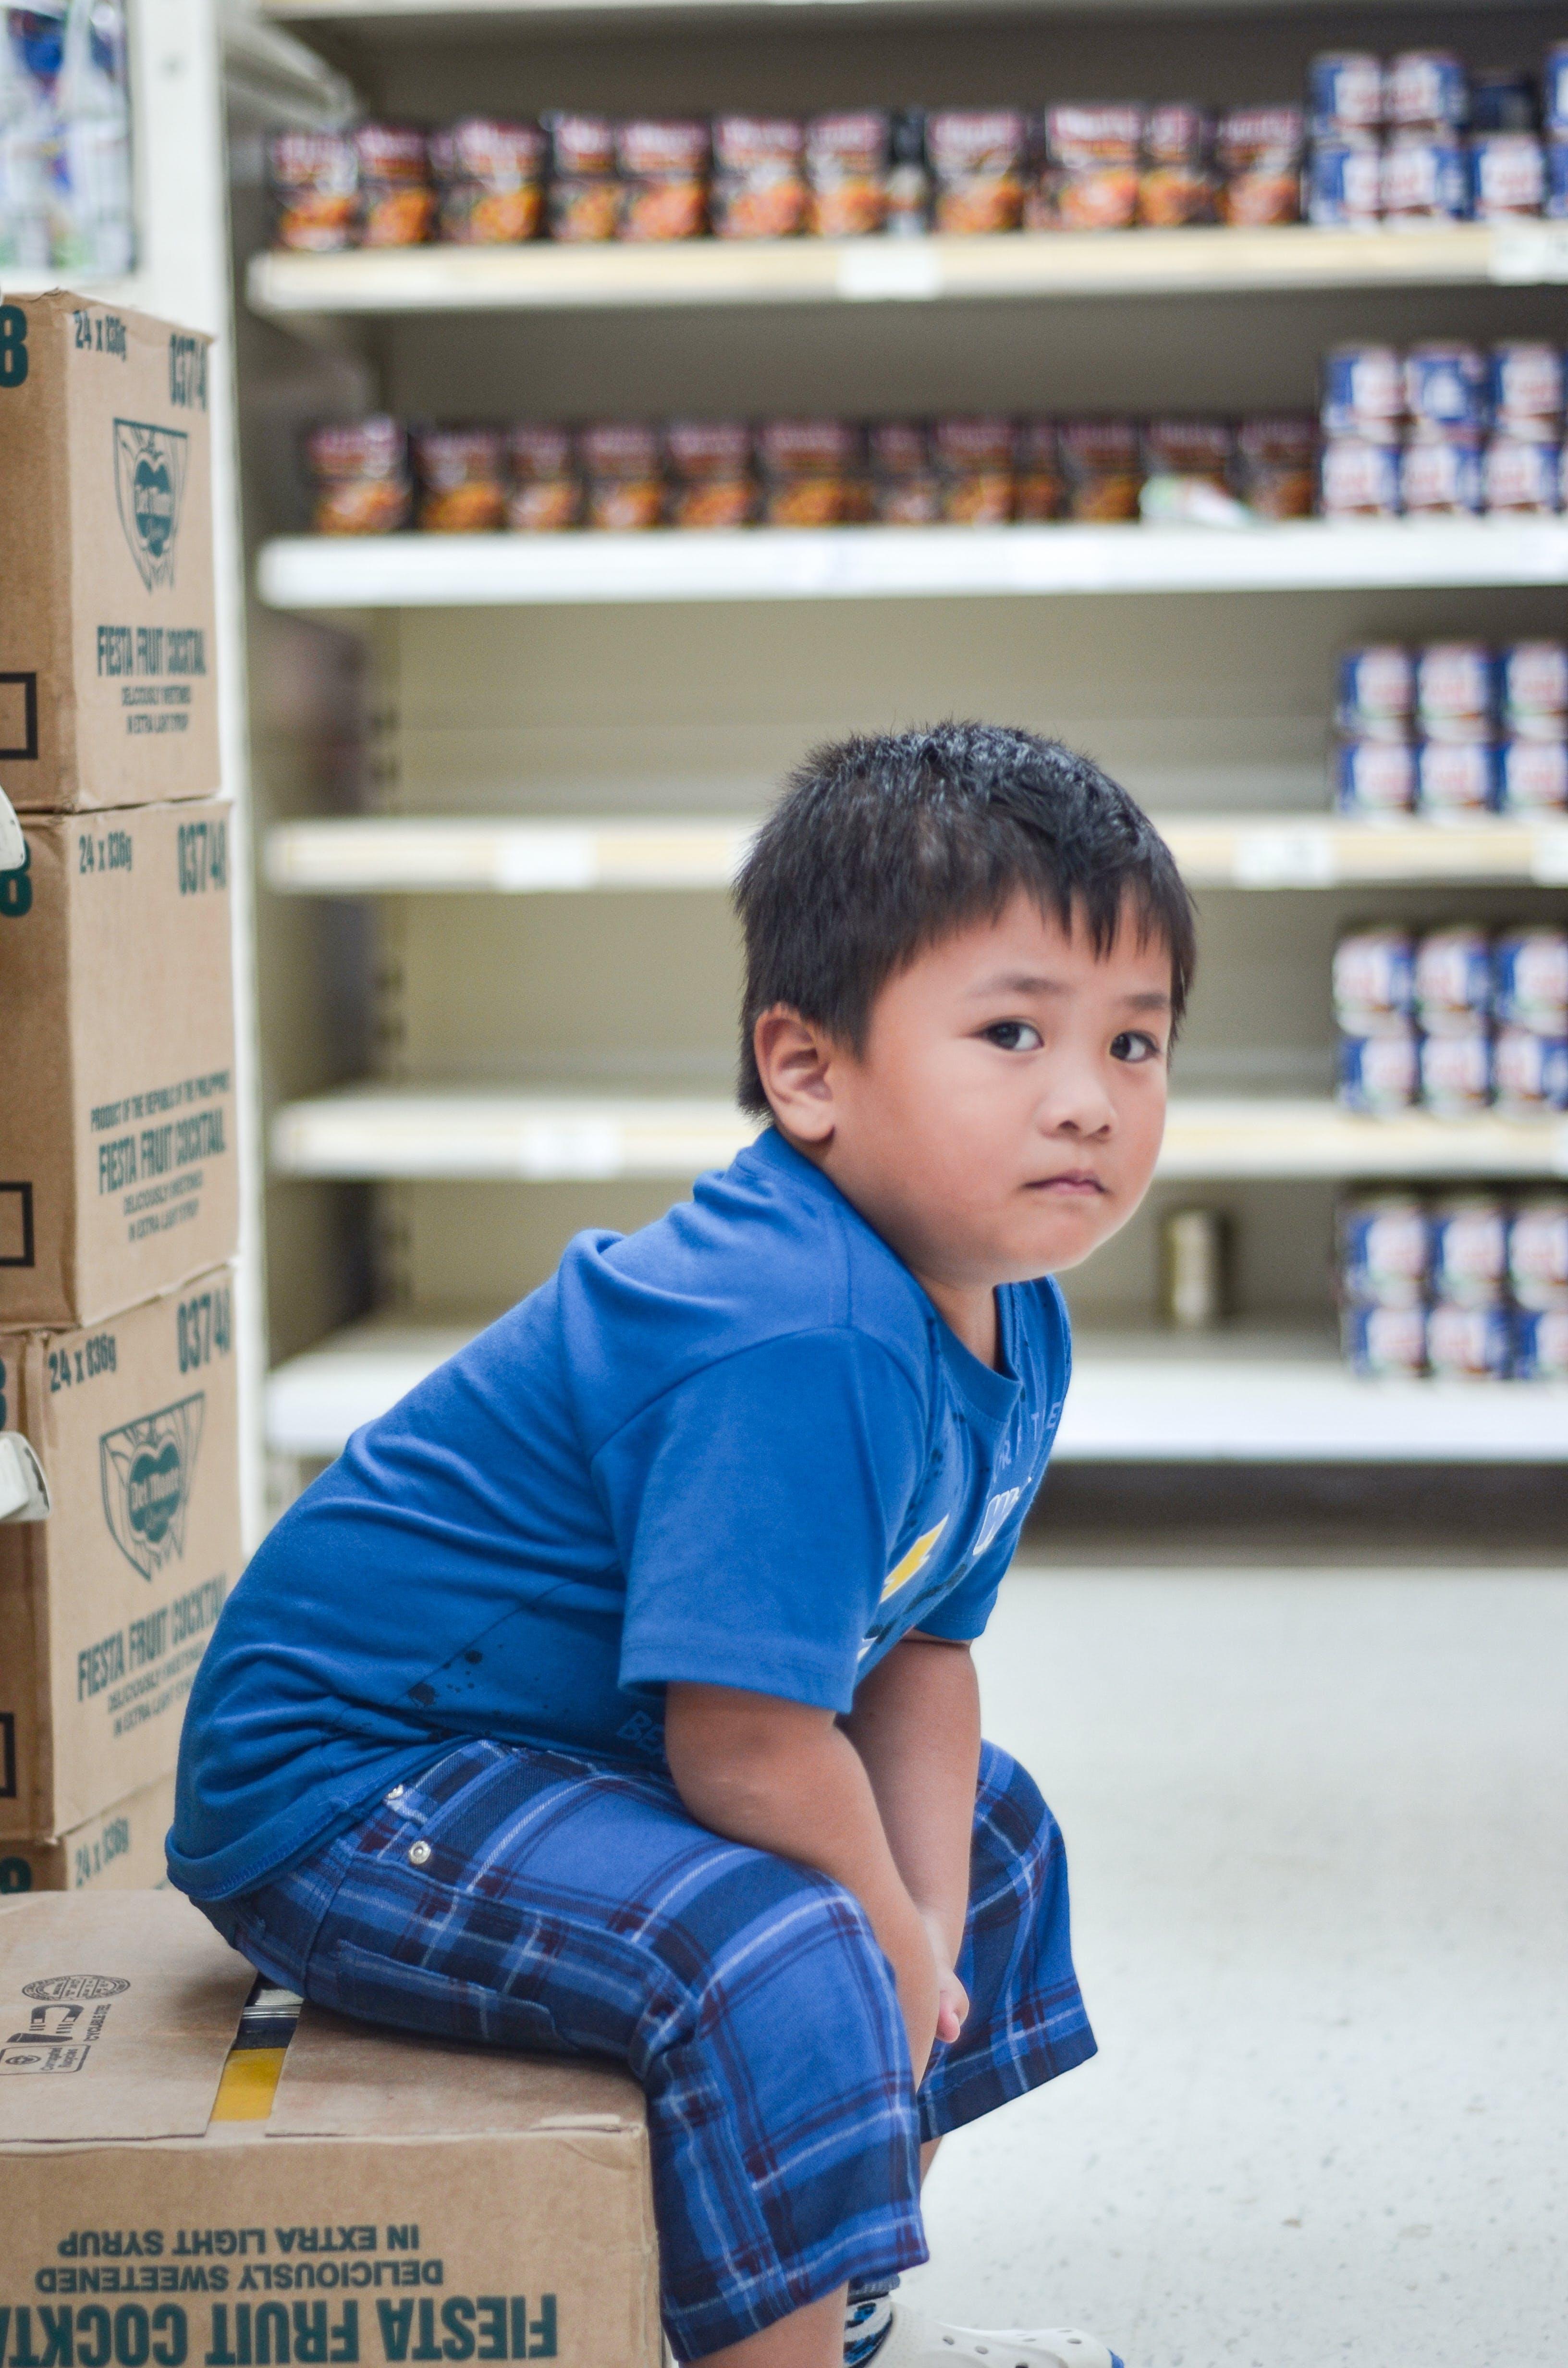 Boy Wearing Blue Crew-neck T-shirt Sitting on Cardboard Box